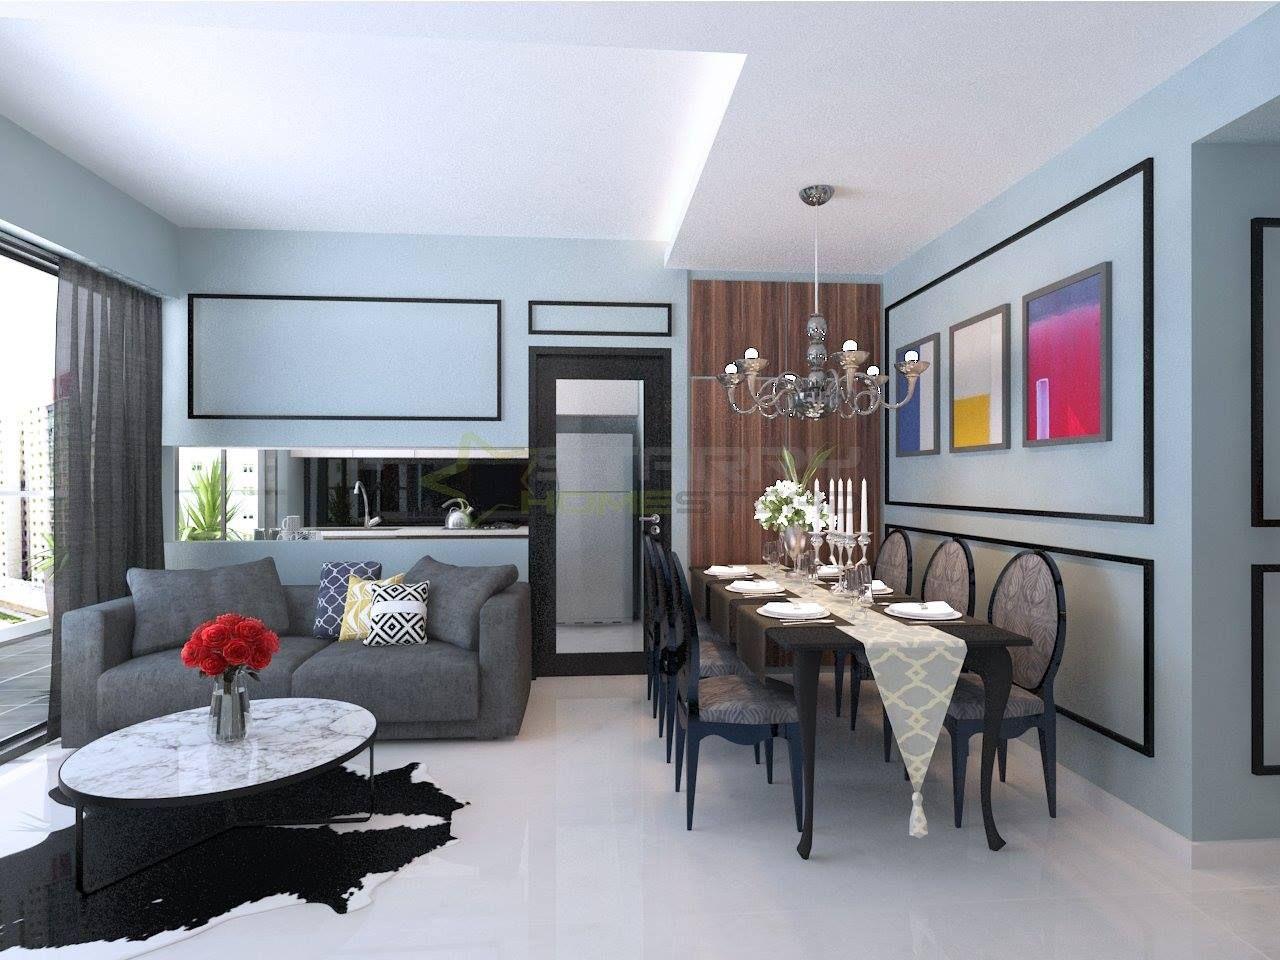 Modern Victorian Design By Starry Homestead Pte Ltd Login To